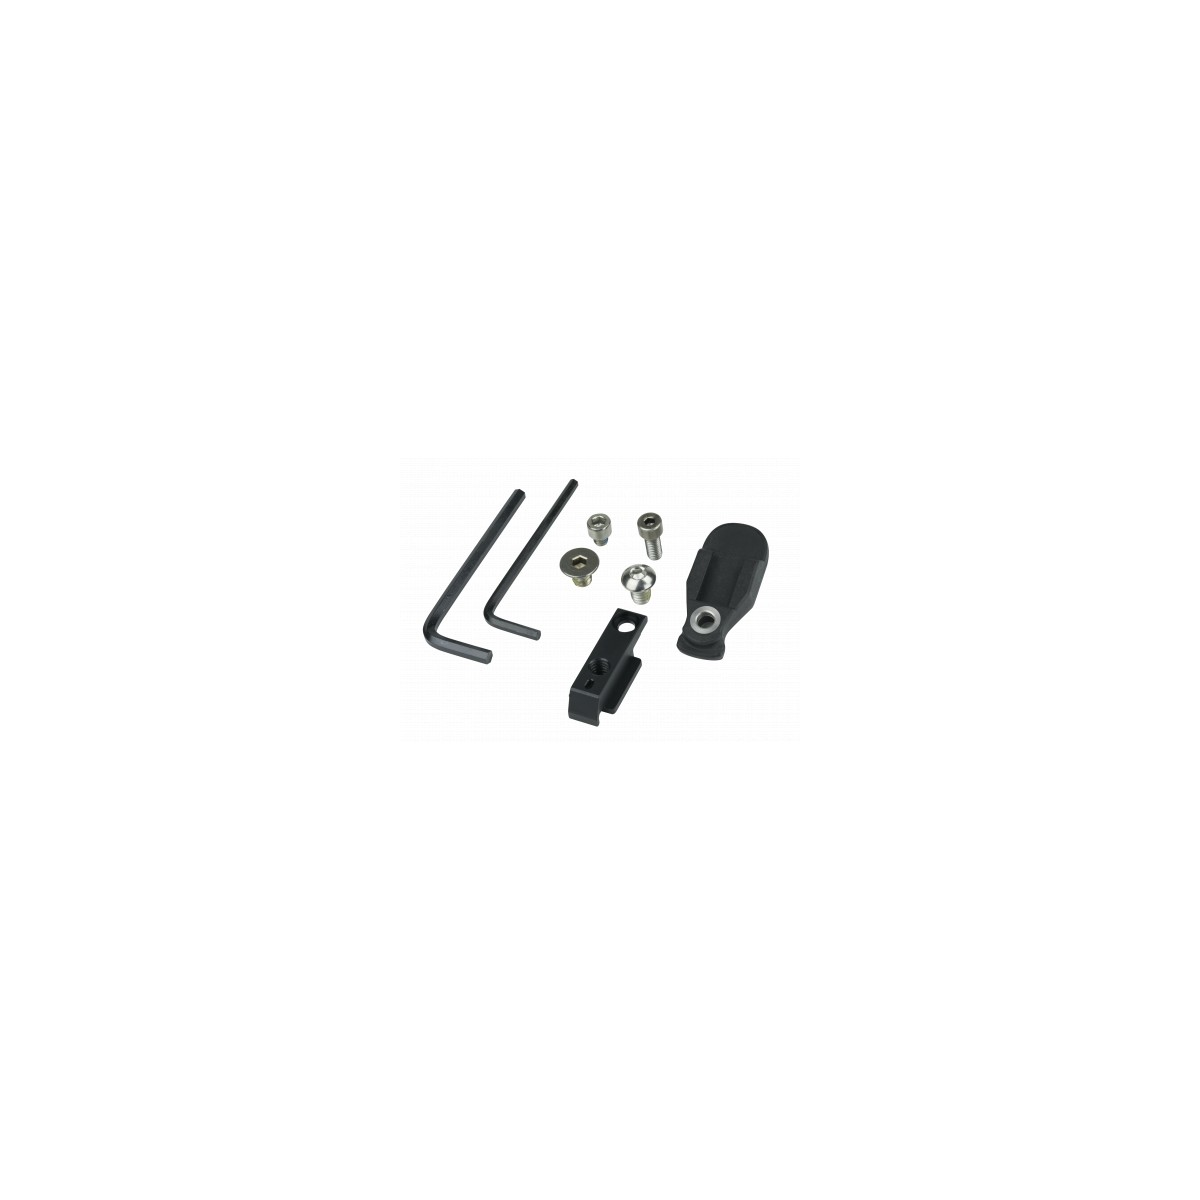 Goodman Handle Adapter